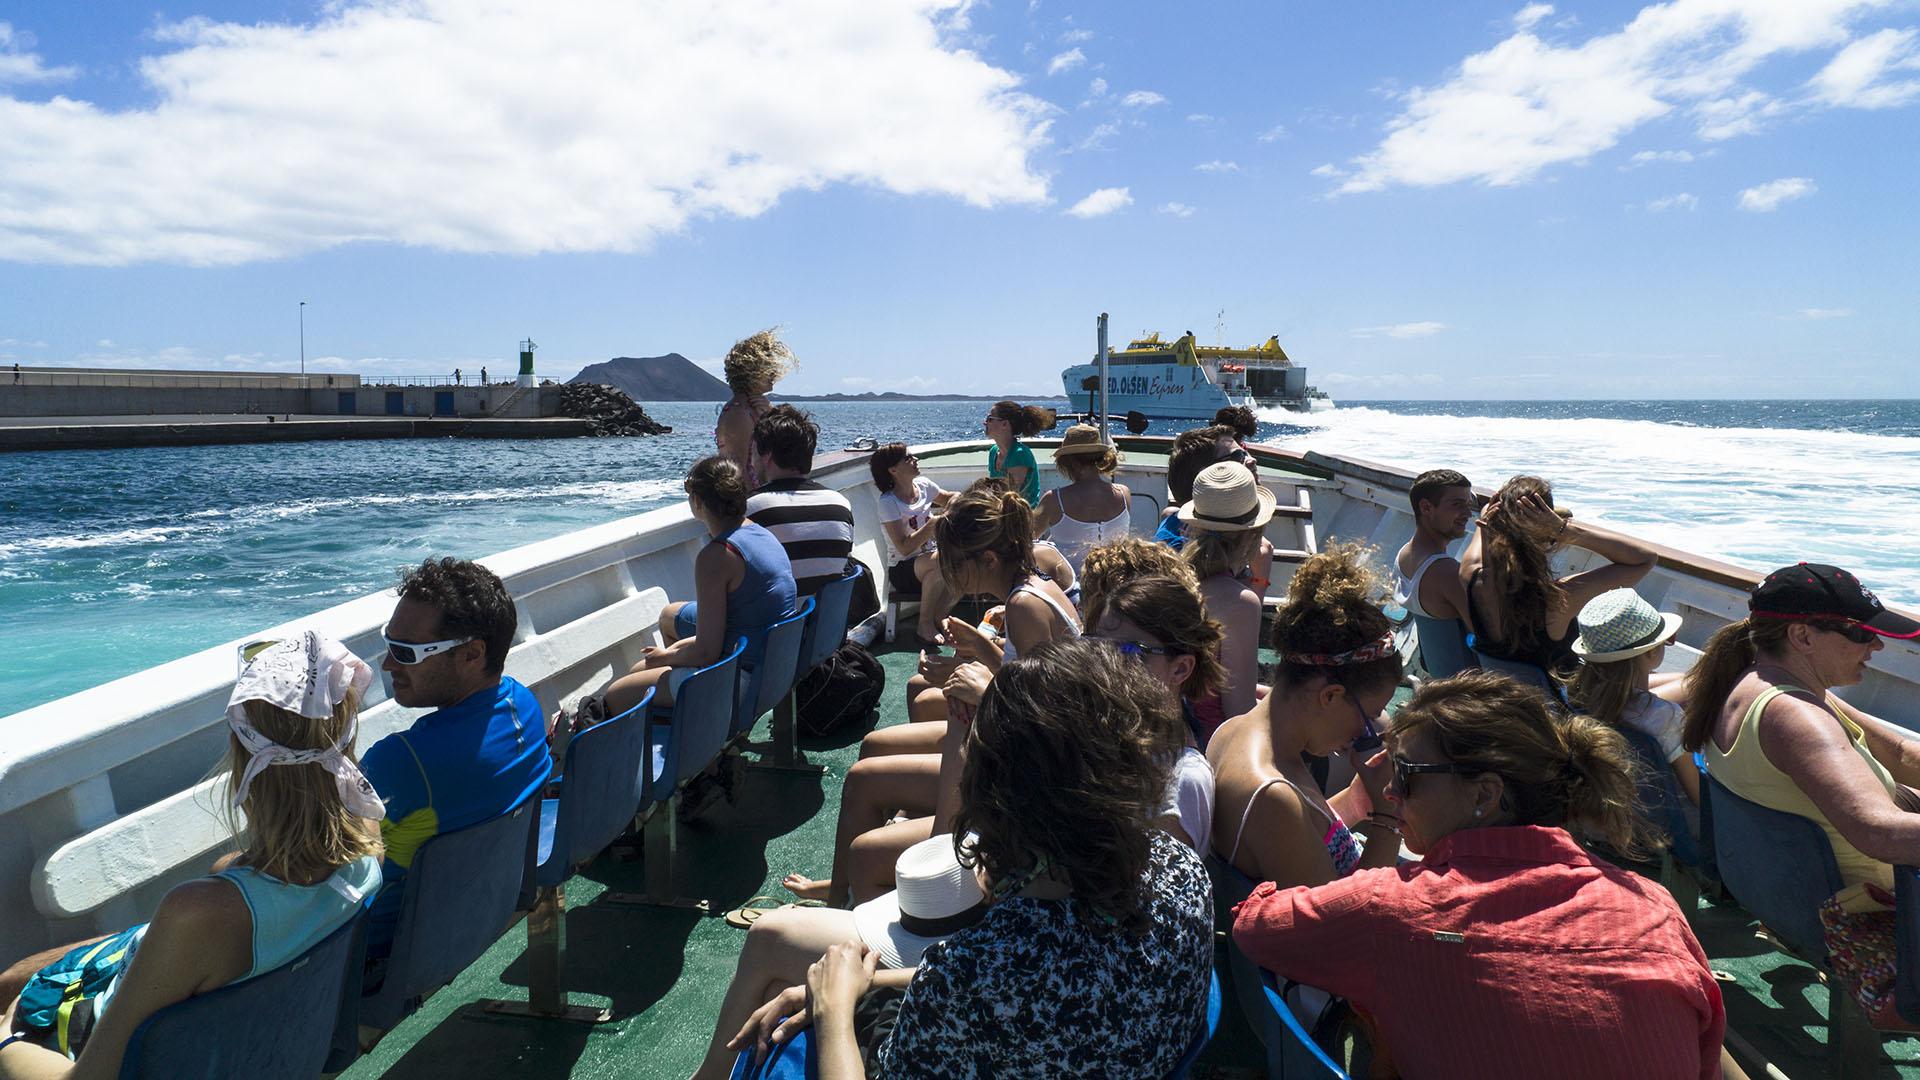 Fuerteventura entdecken – die kleine Insel Isla de Lobos vor Fuerteventura.